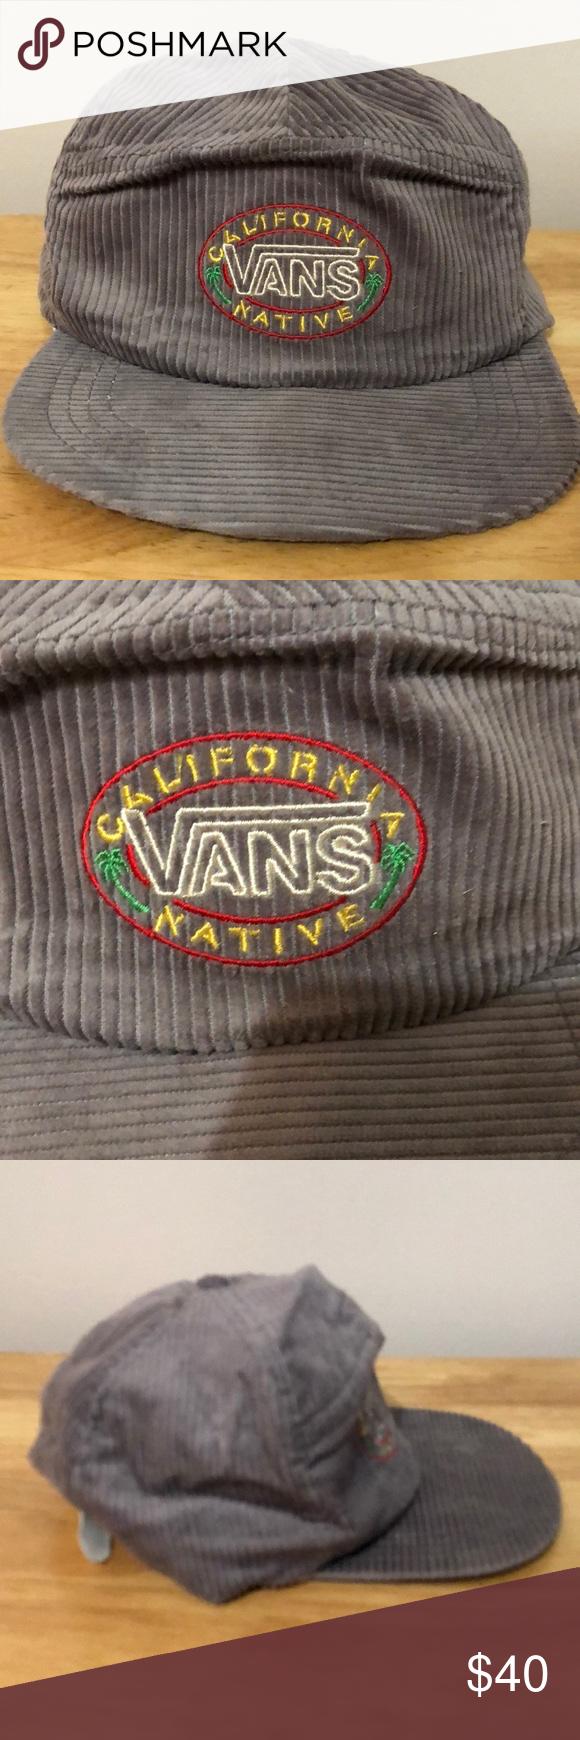 Vintage Vans California Native Corduroy Hat Vintage Vans Corduroy Hat Vans California